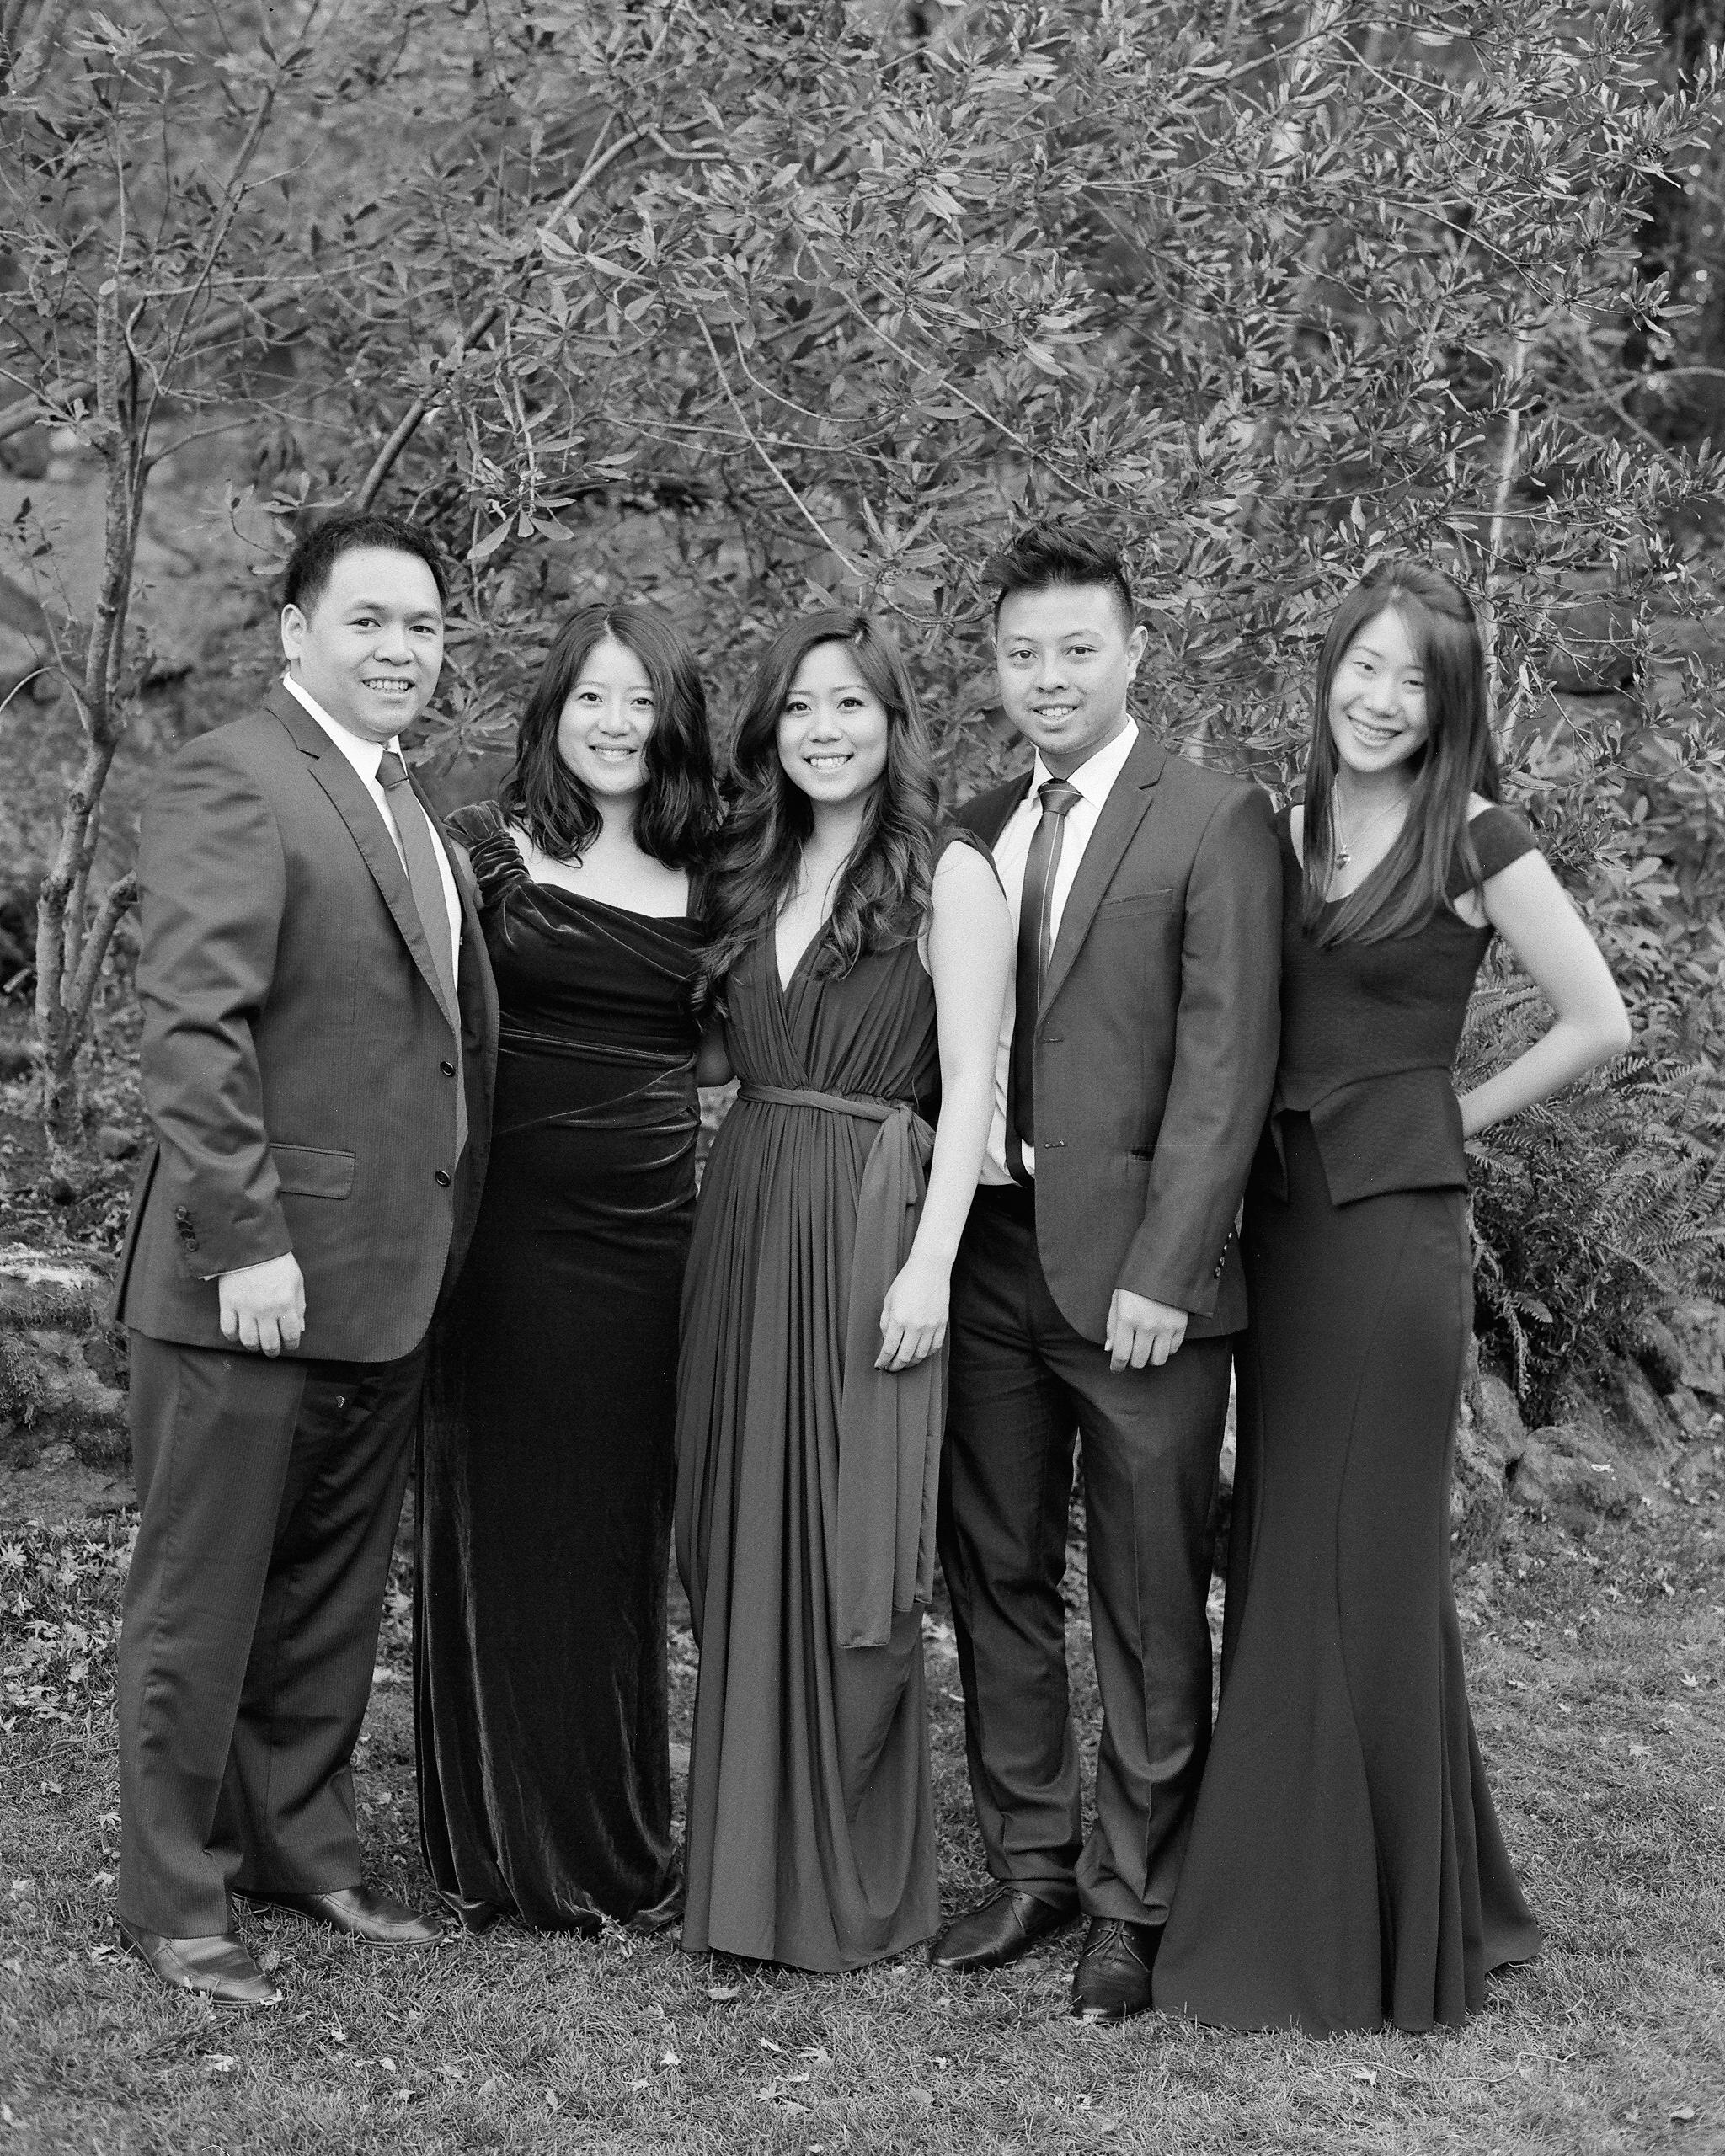 adriana-han-wedding-000022390016-s111814.jpg